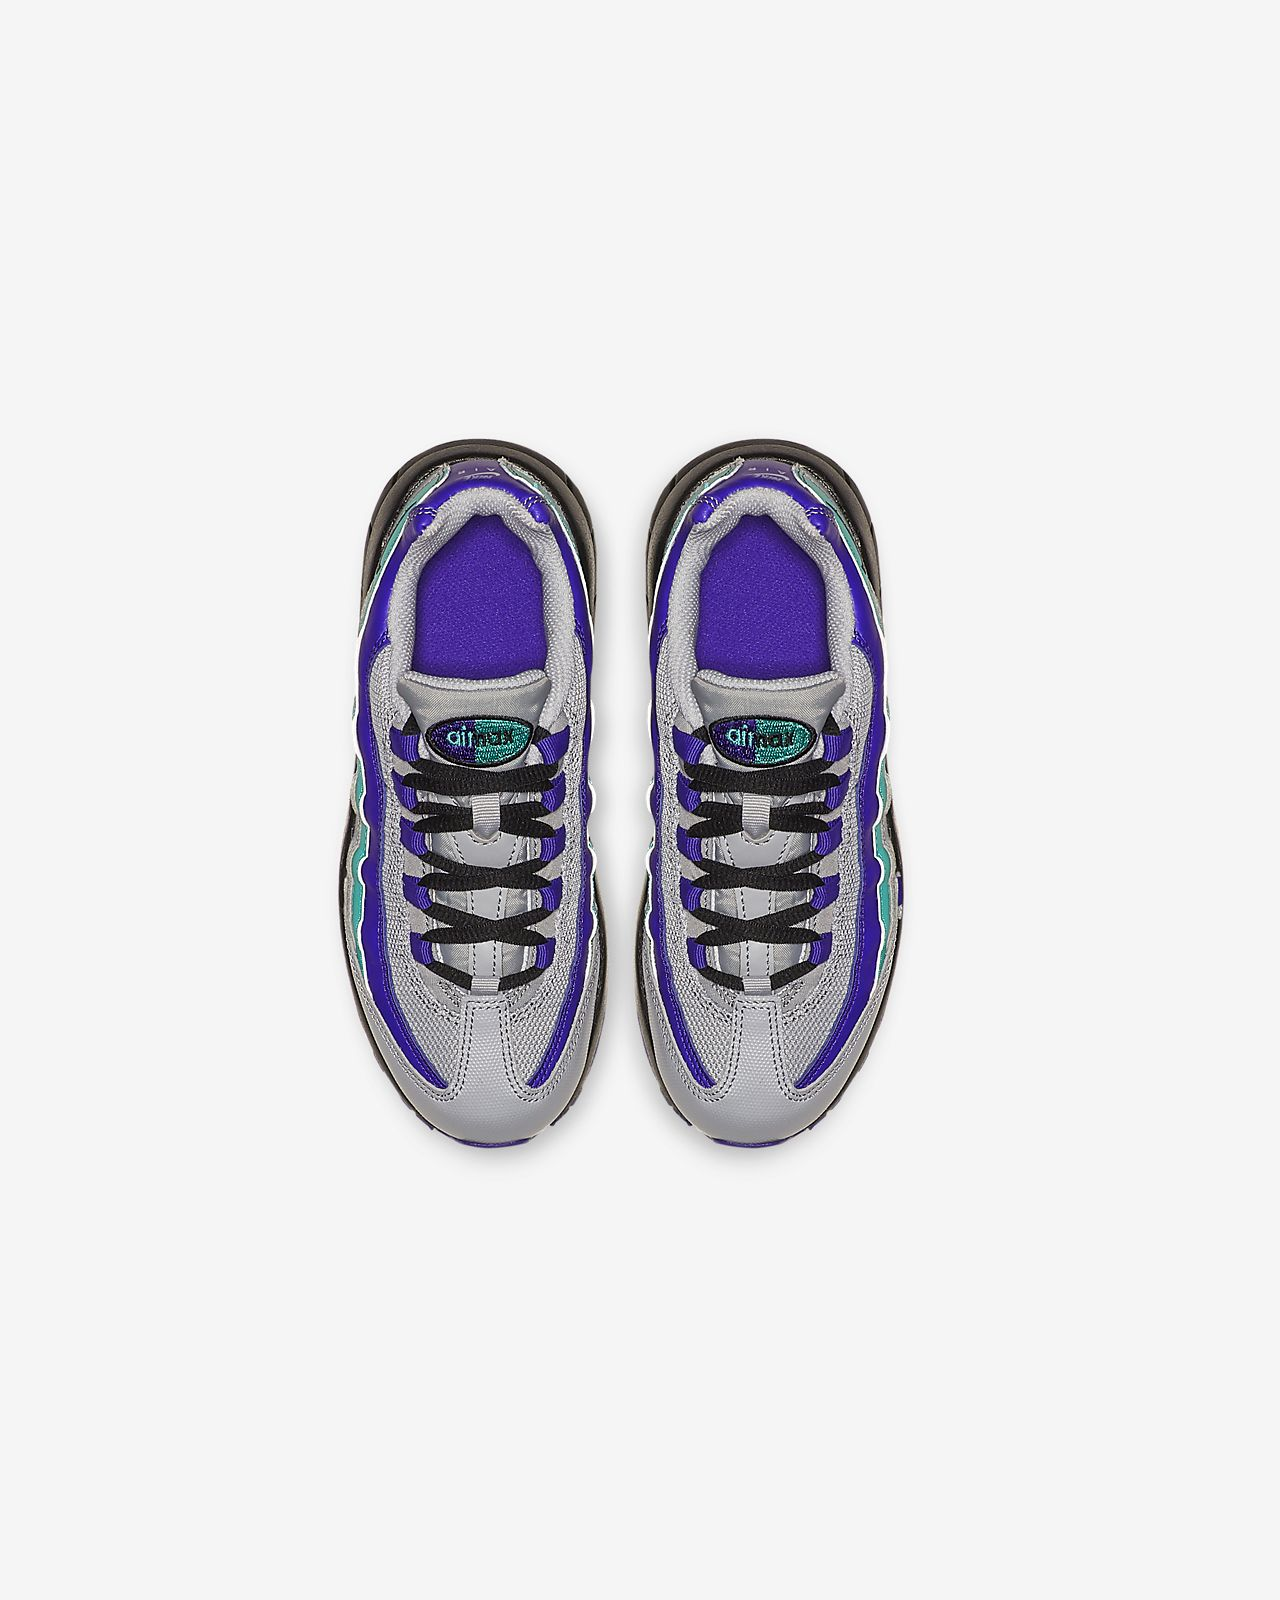 30bfc69bc0a4ba Nike Air Max 95 Little Kids  Shoe. Nike.com